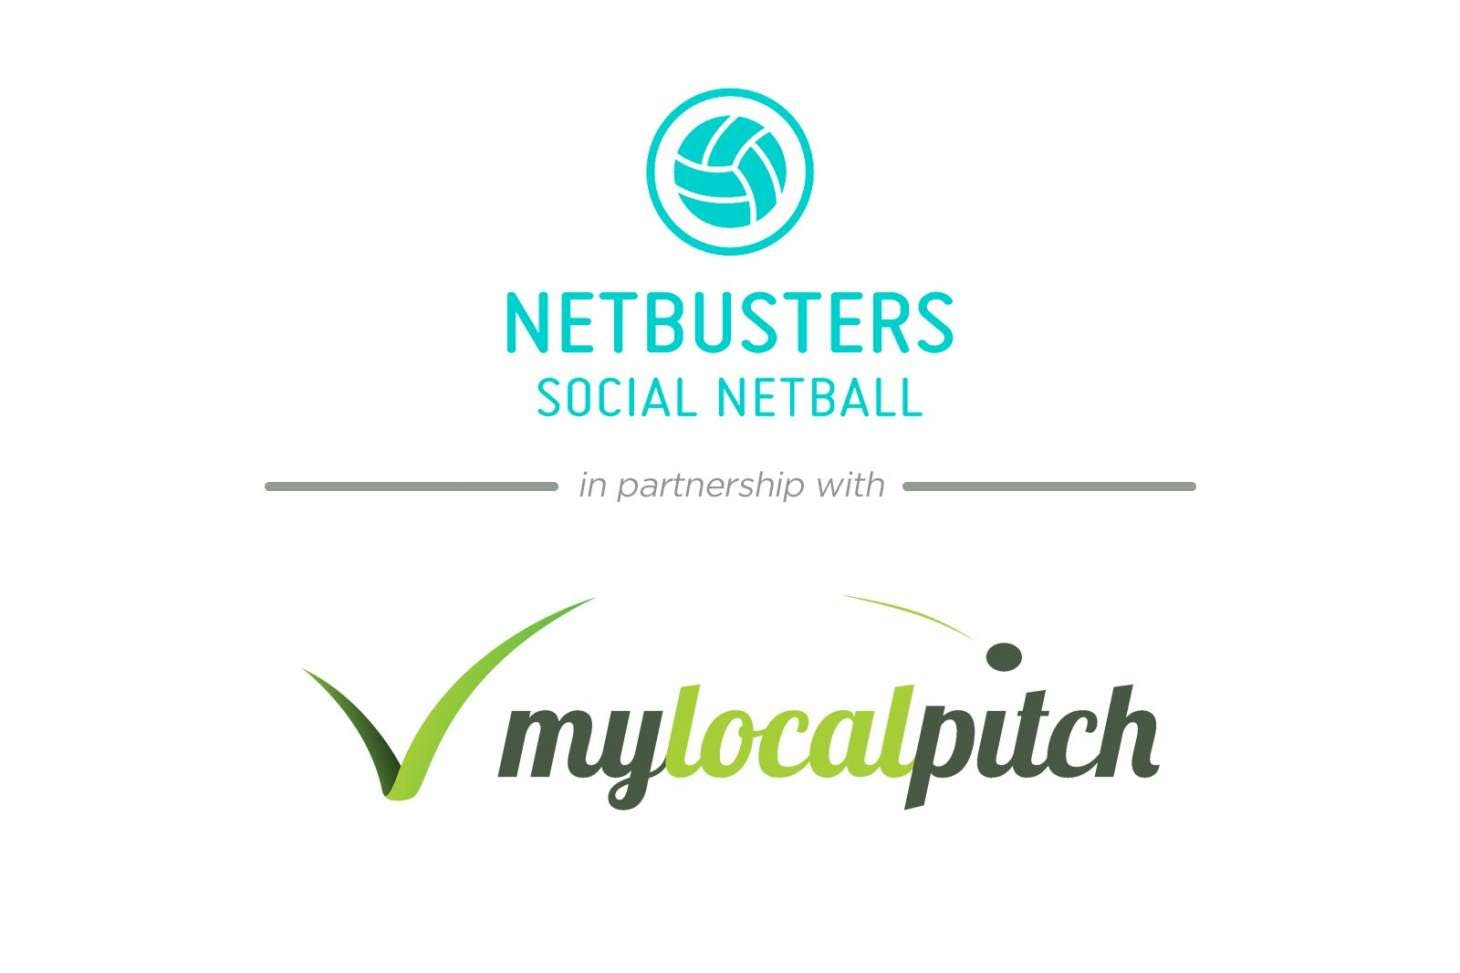 Clapham Common - Netbusters Outdoor | Hard (macadam) netball court